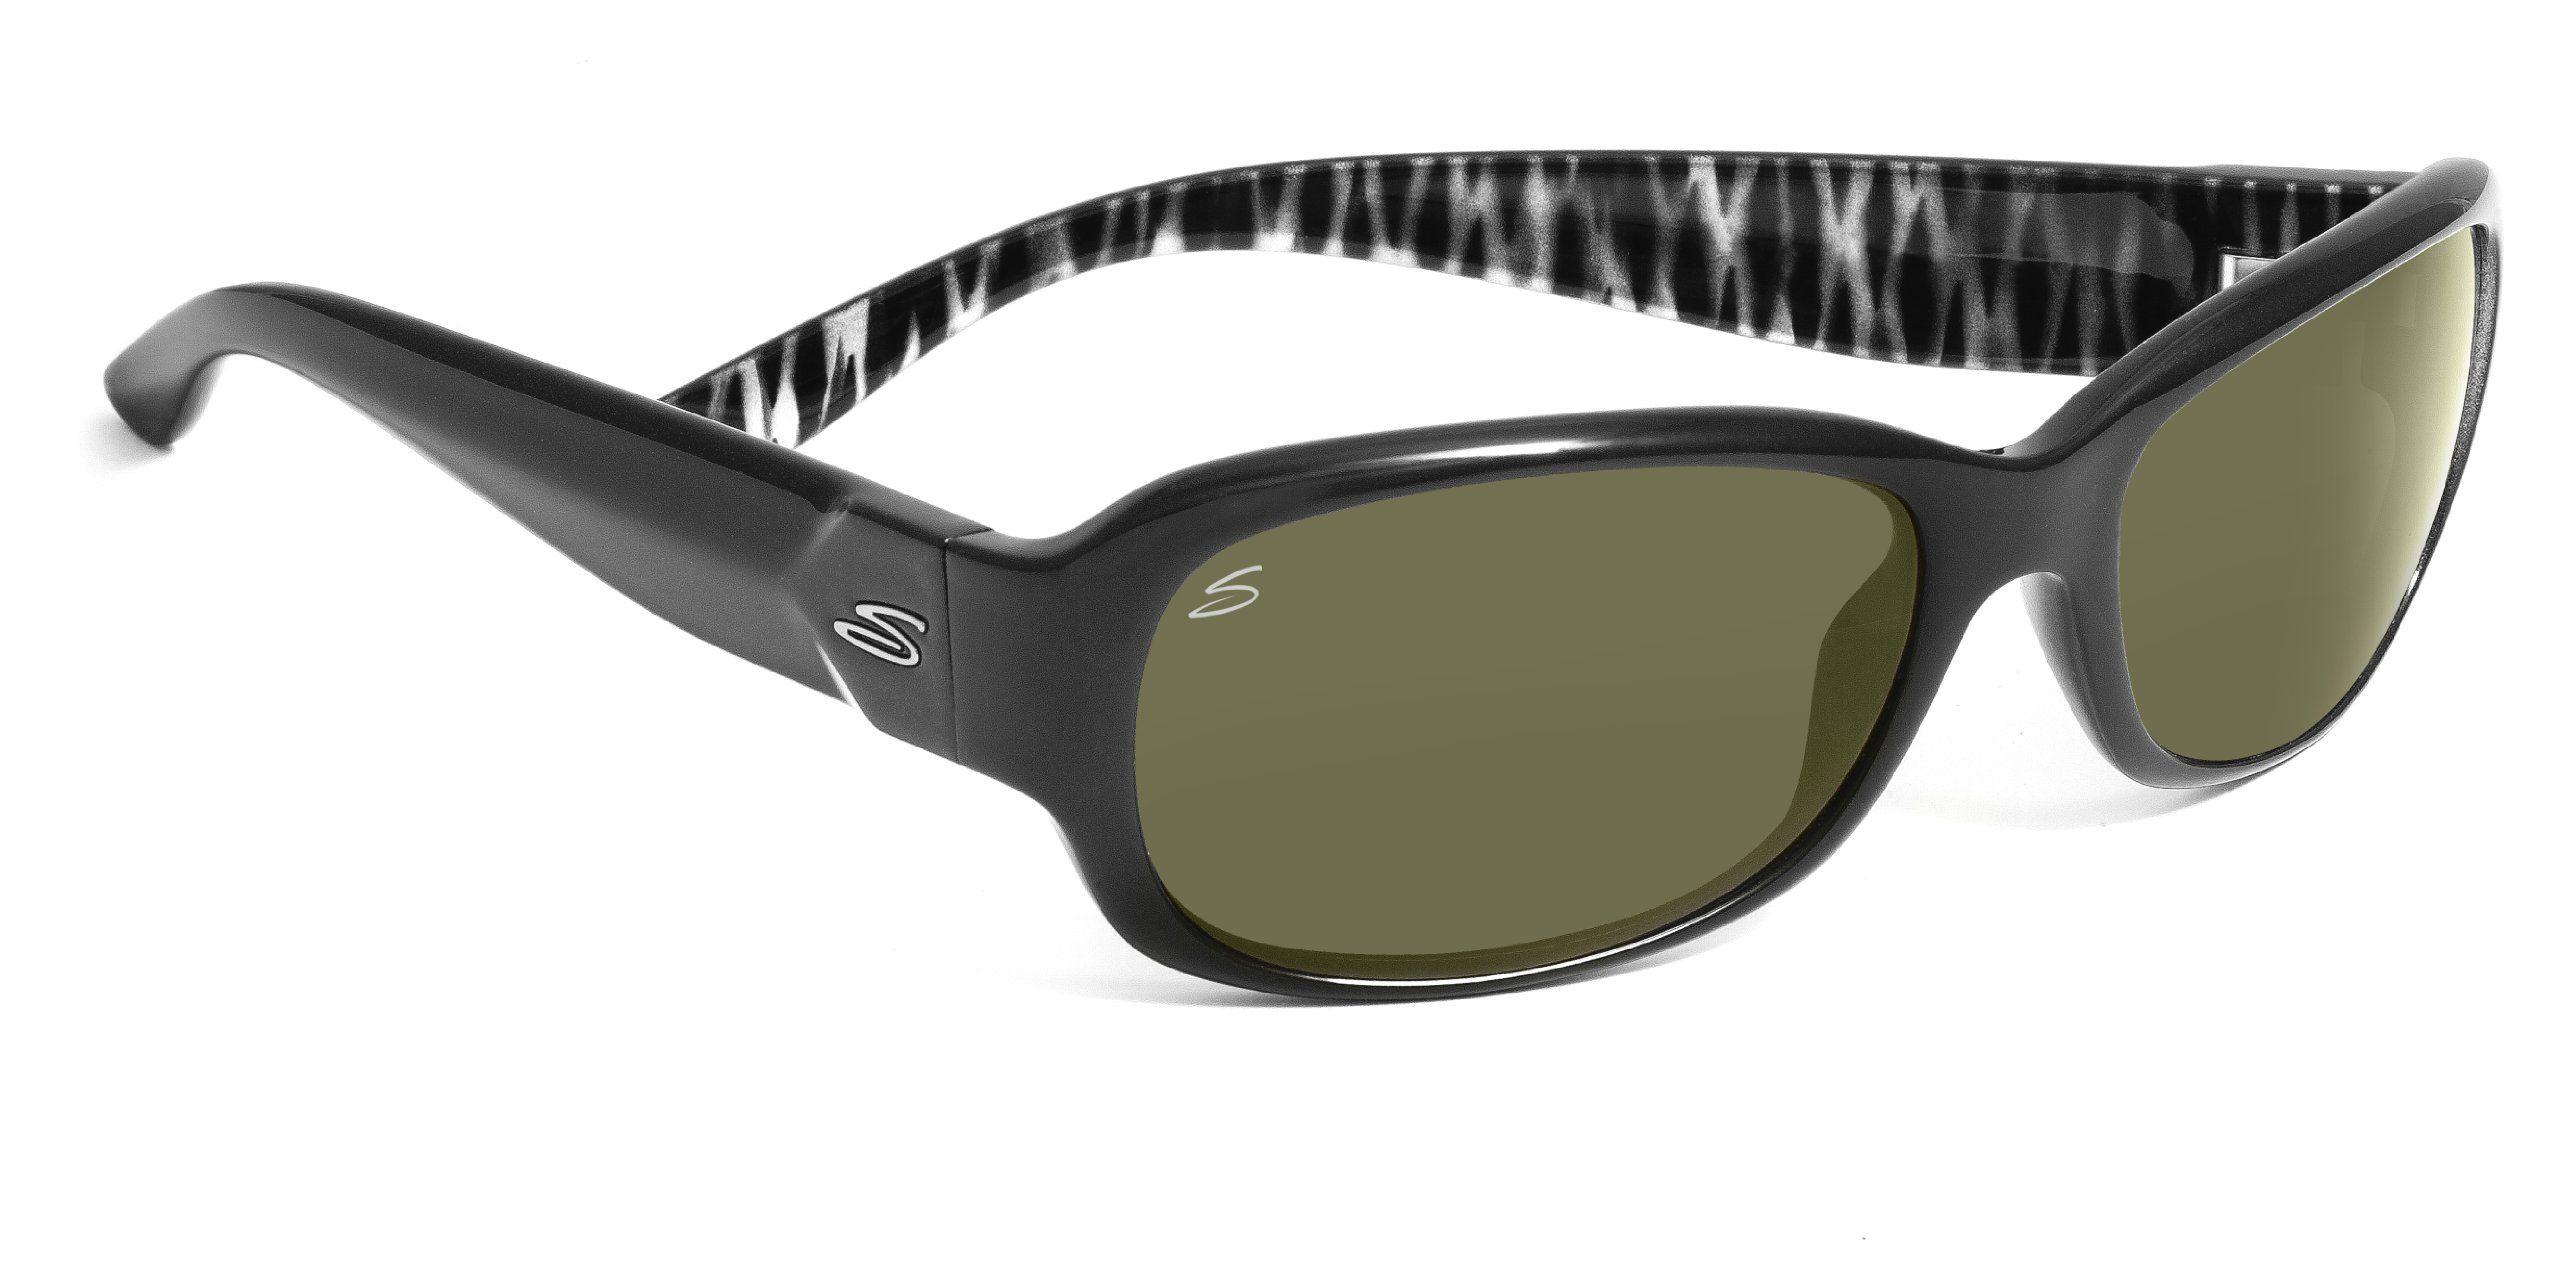 6b12696dbb Serengeti Chloe Sunglasses (Drivers Gold Polarized